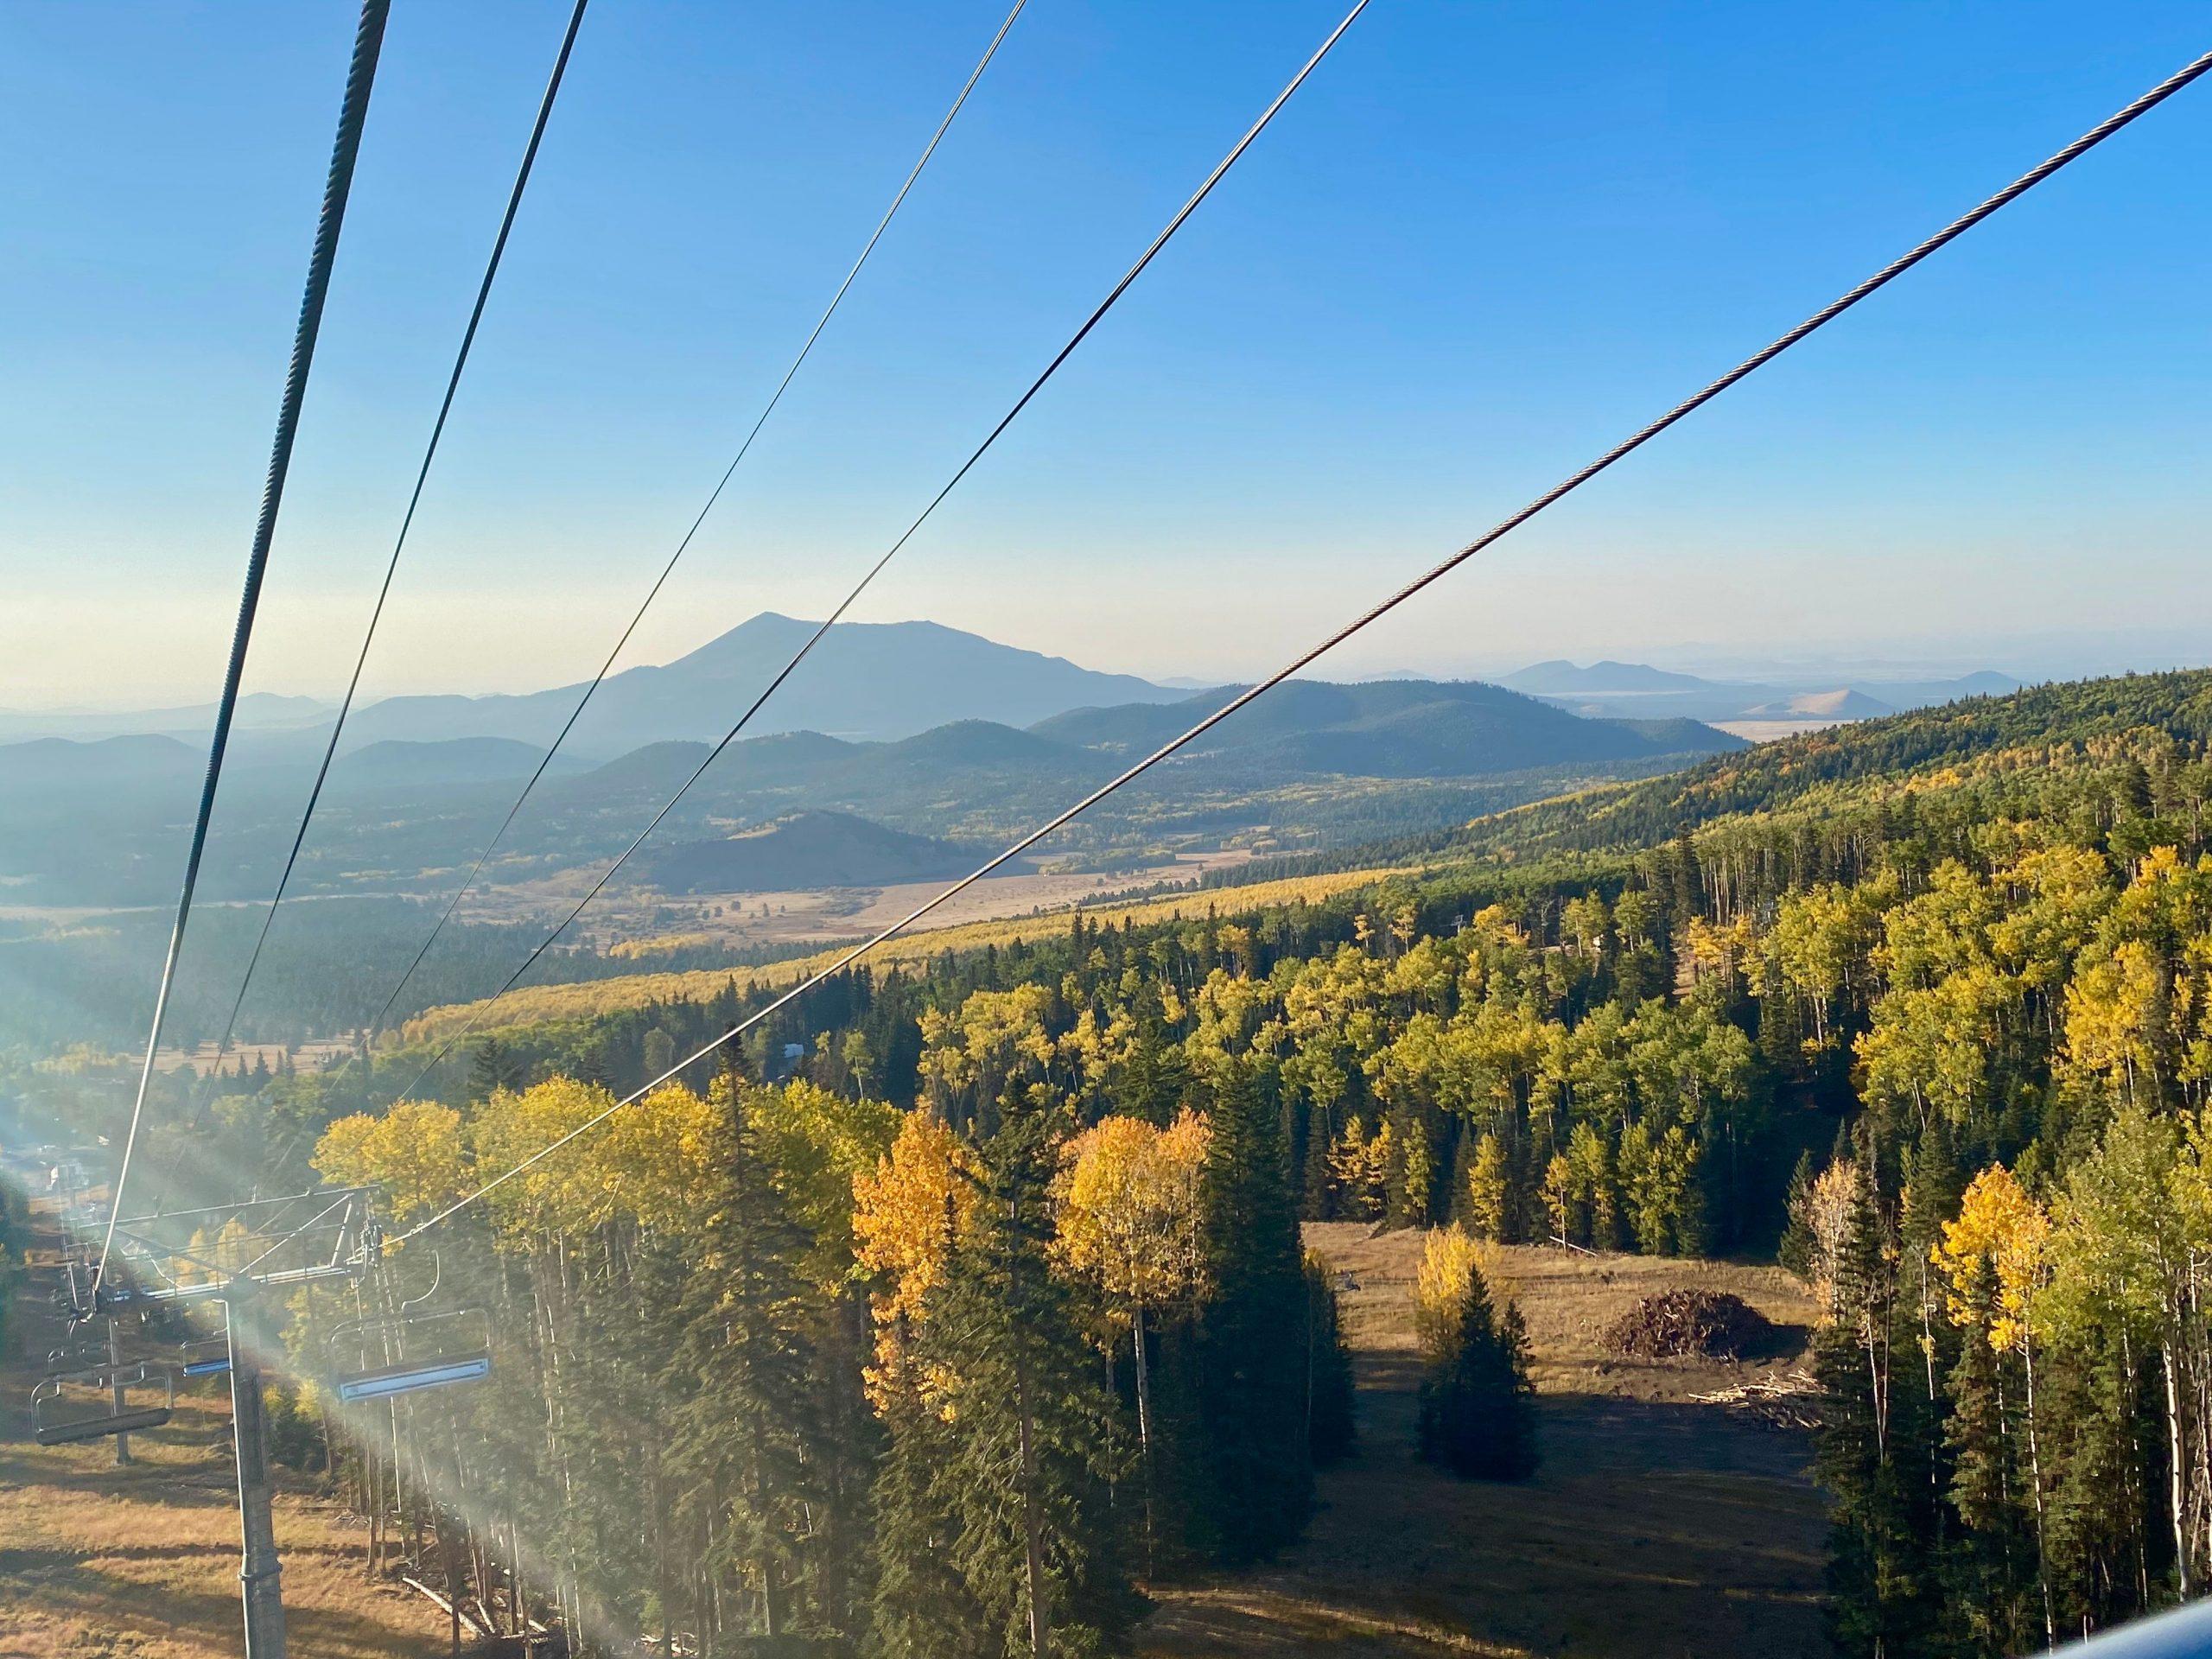 Arizona Snowbowl Scenic Chairlift in Fall